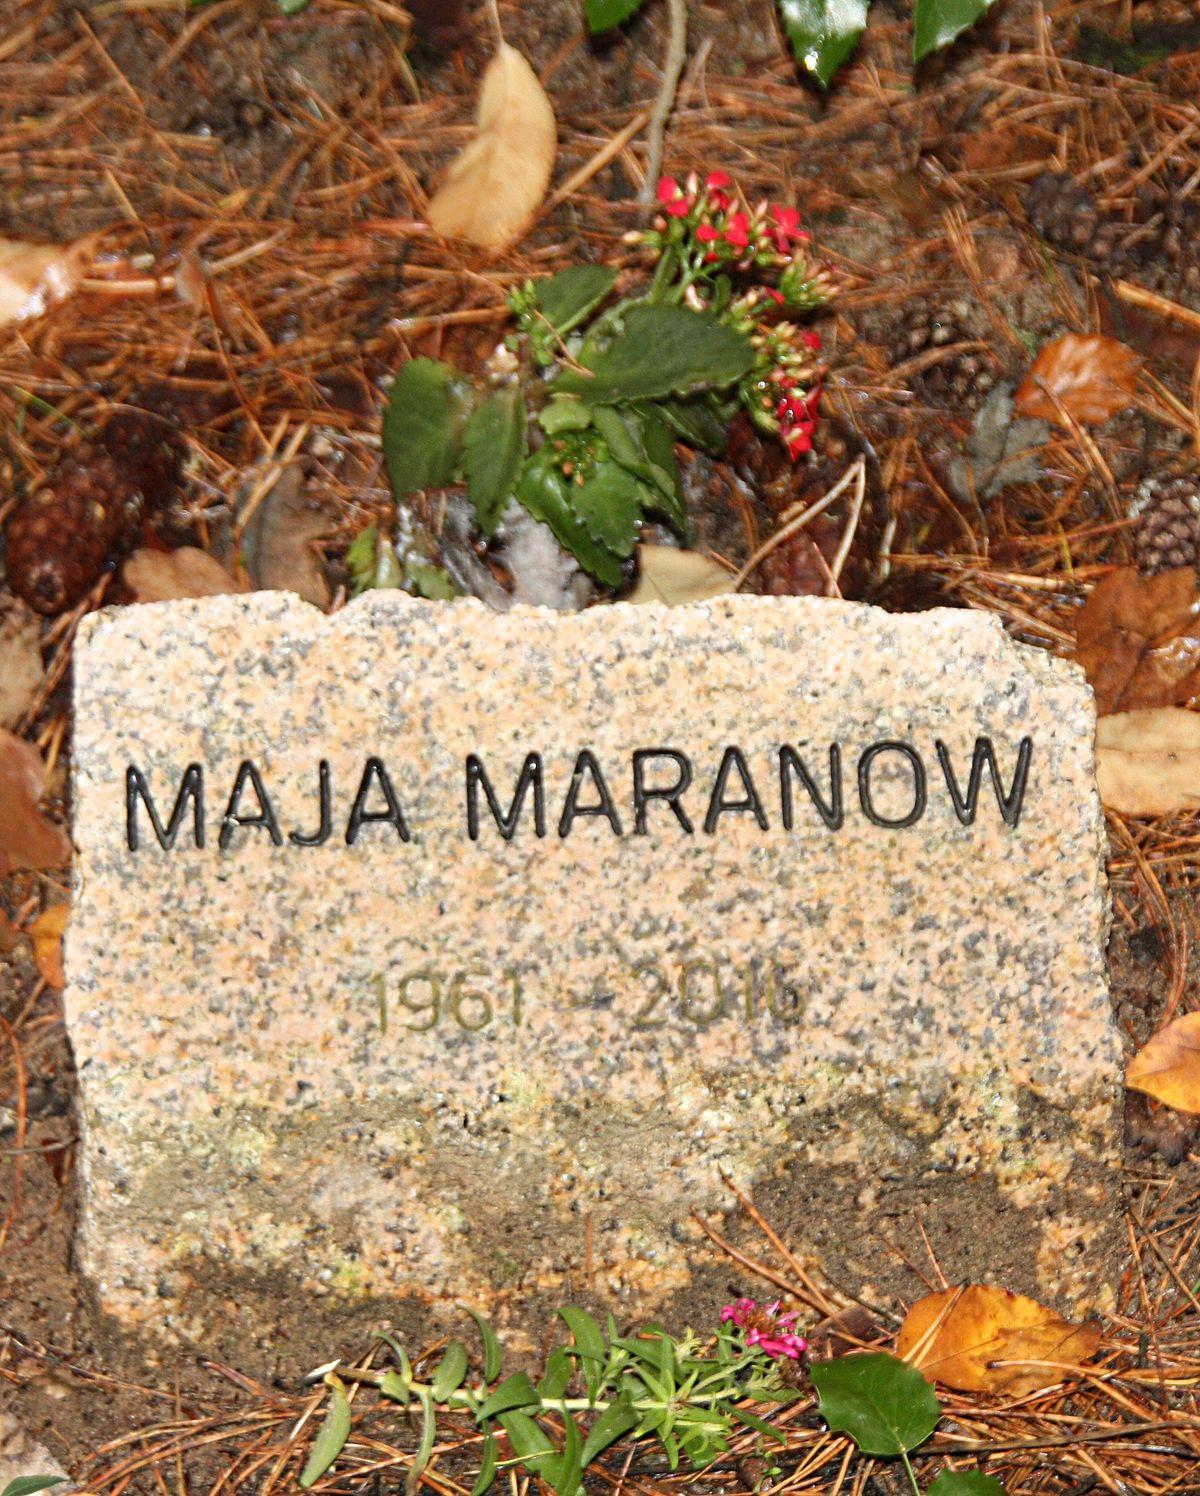 Maranow